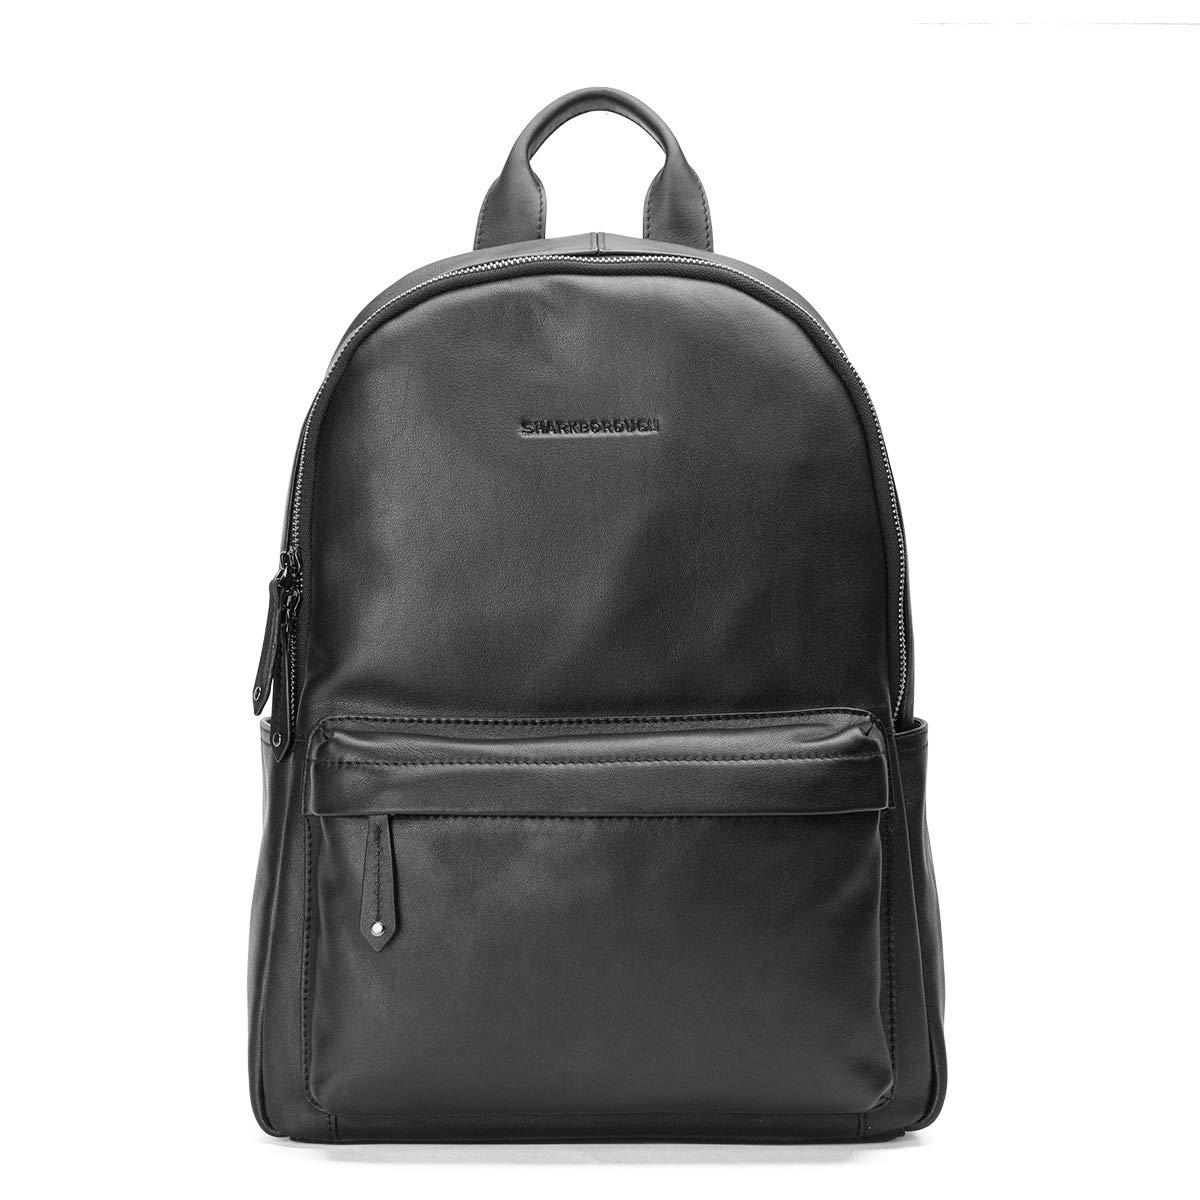 e16a60866 Amazon.com | Sharkborough Jackson Men's Backpack Genuine Leather Travel Bag  Extra Capacity Casual Daypacks (Black - Small Size) | Casual Daypacks